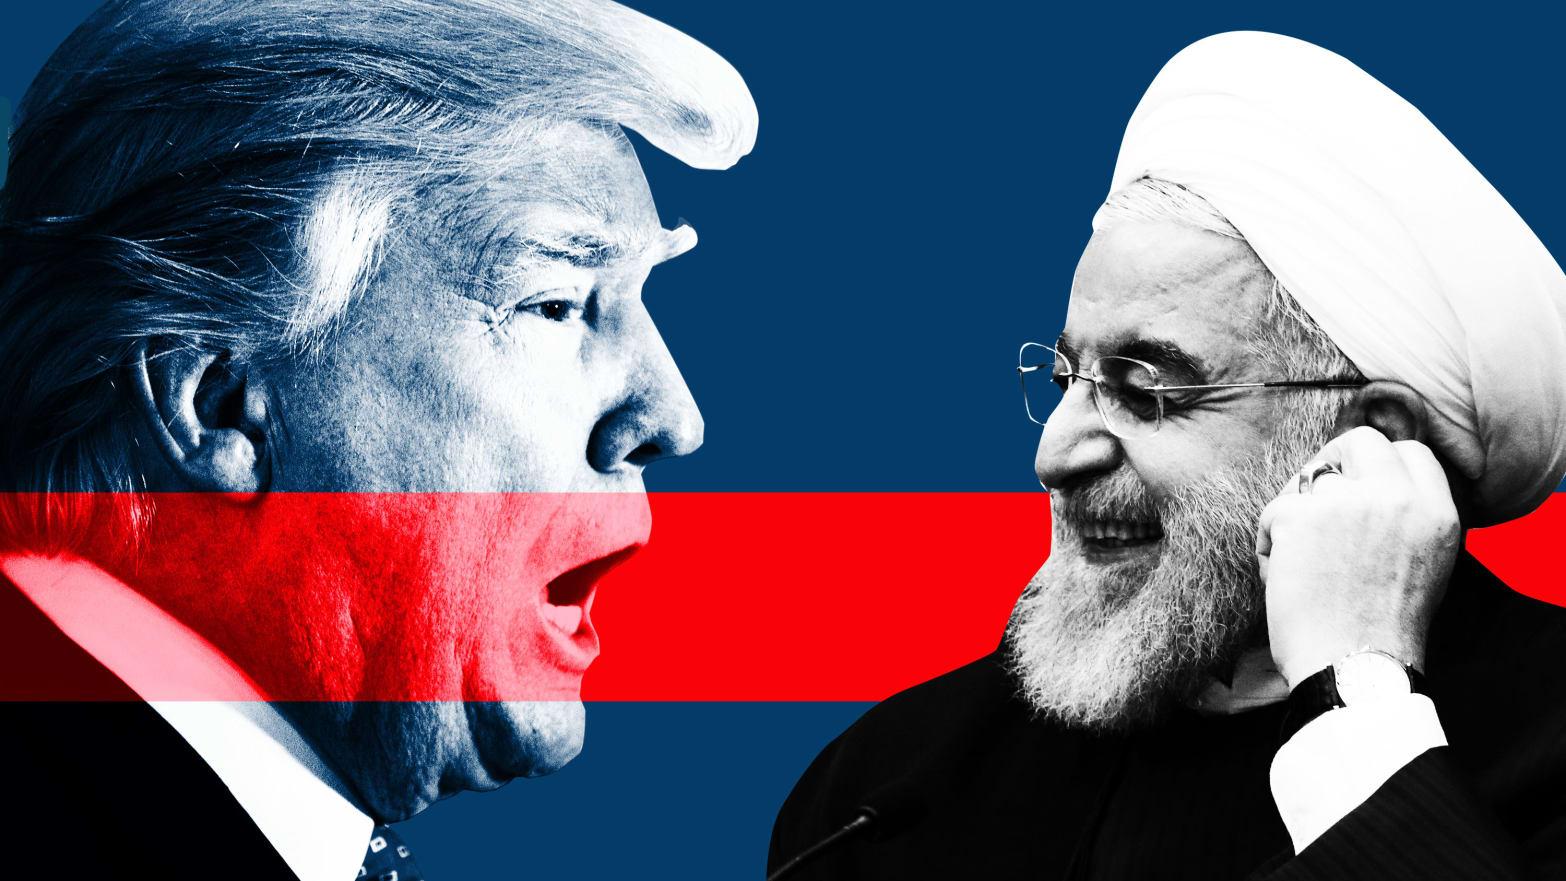 Iran Demands a $15 Billion Credit Before Resuming Talks With Trump and EU